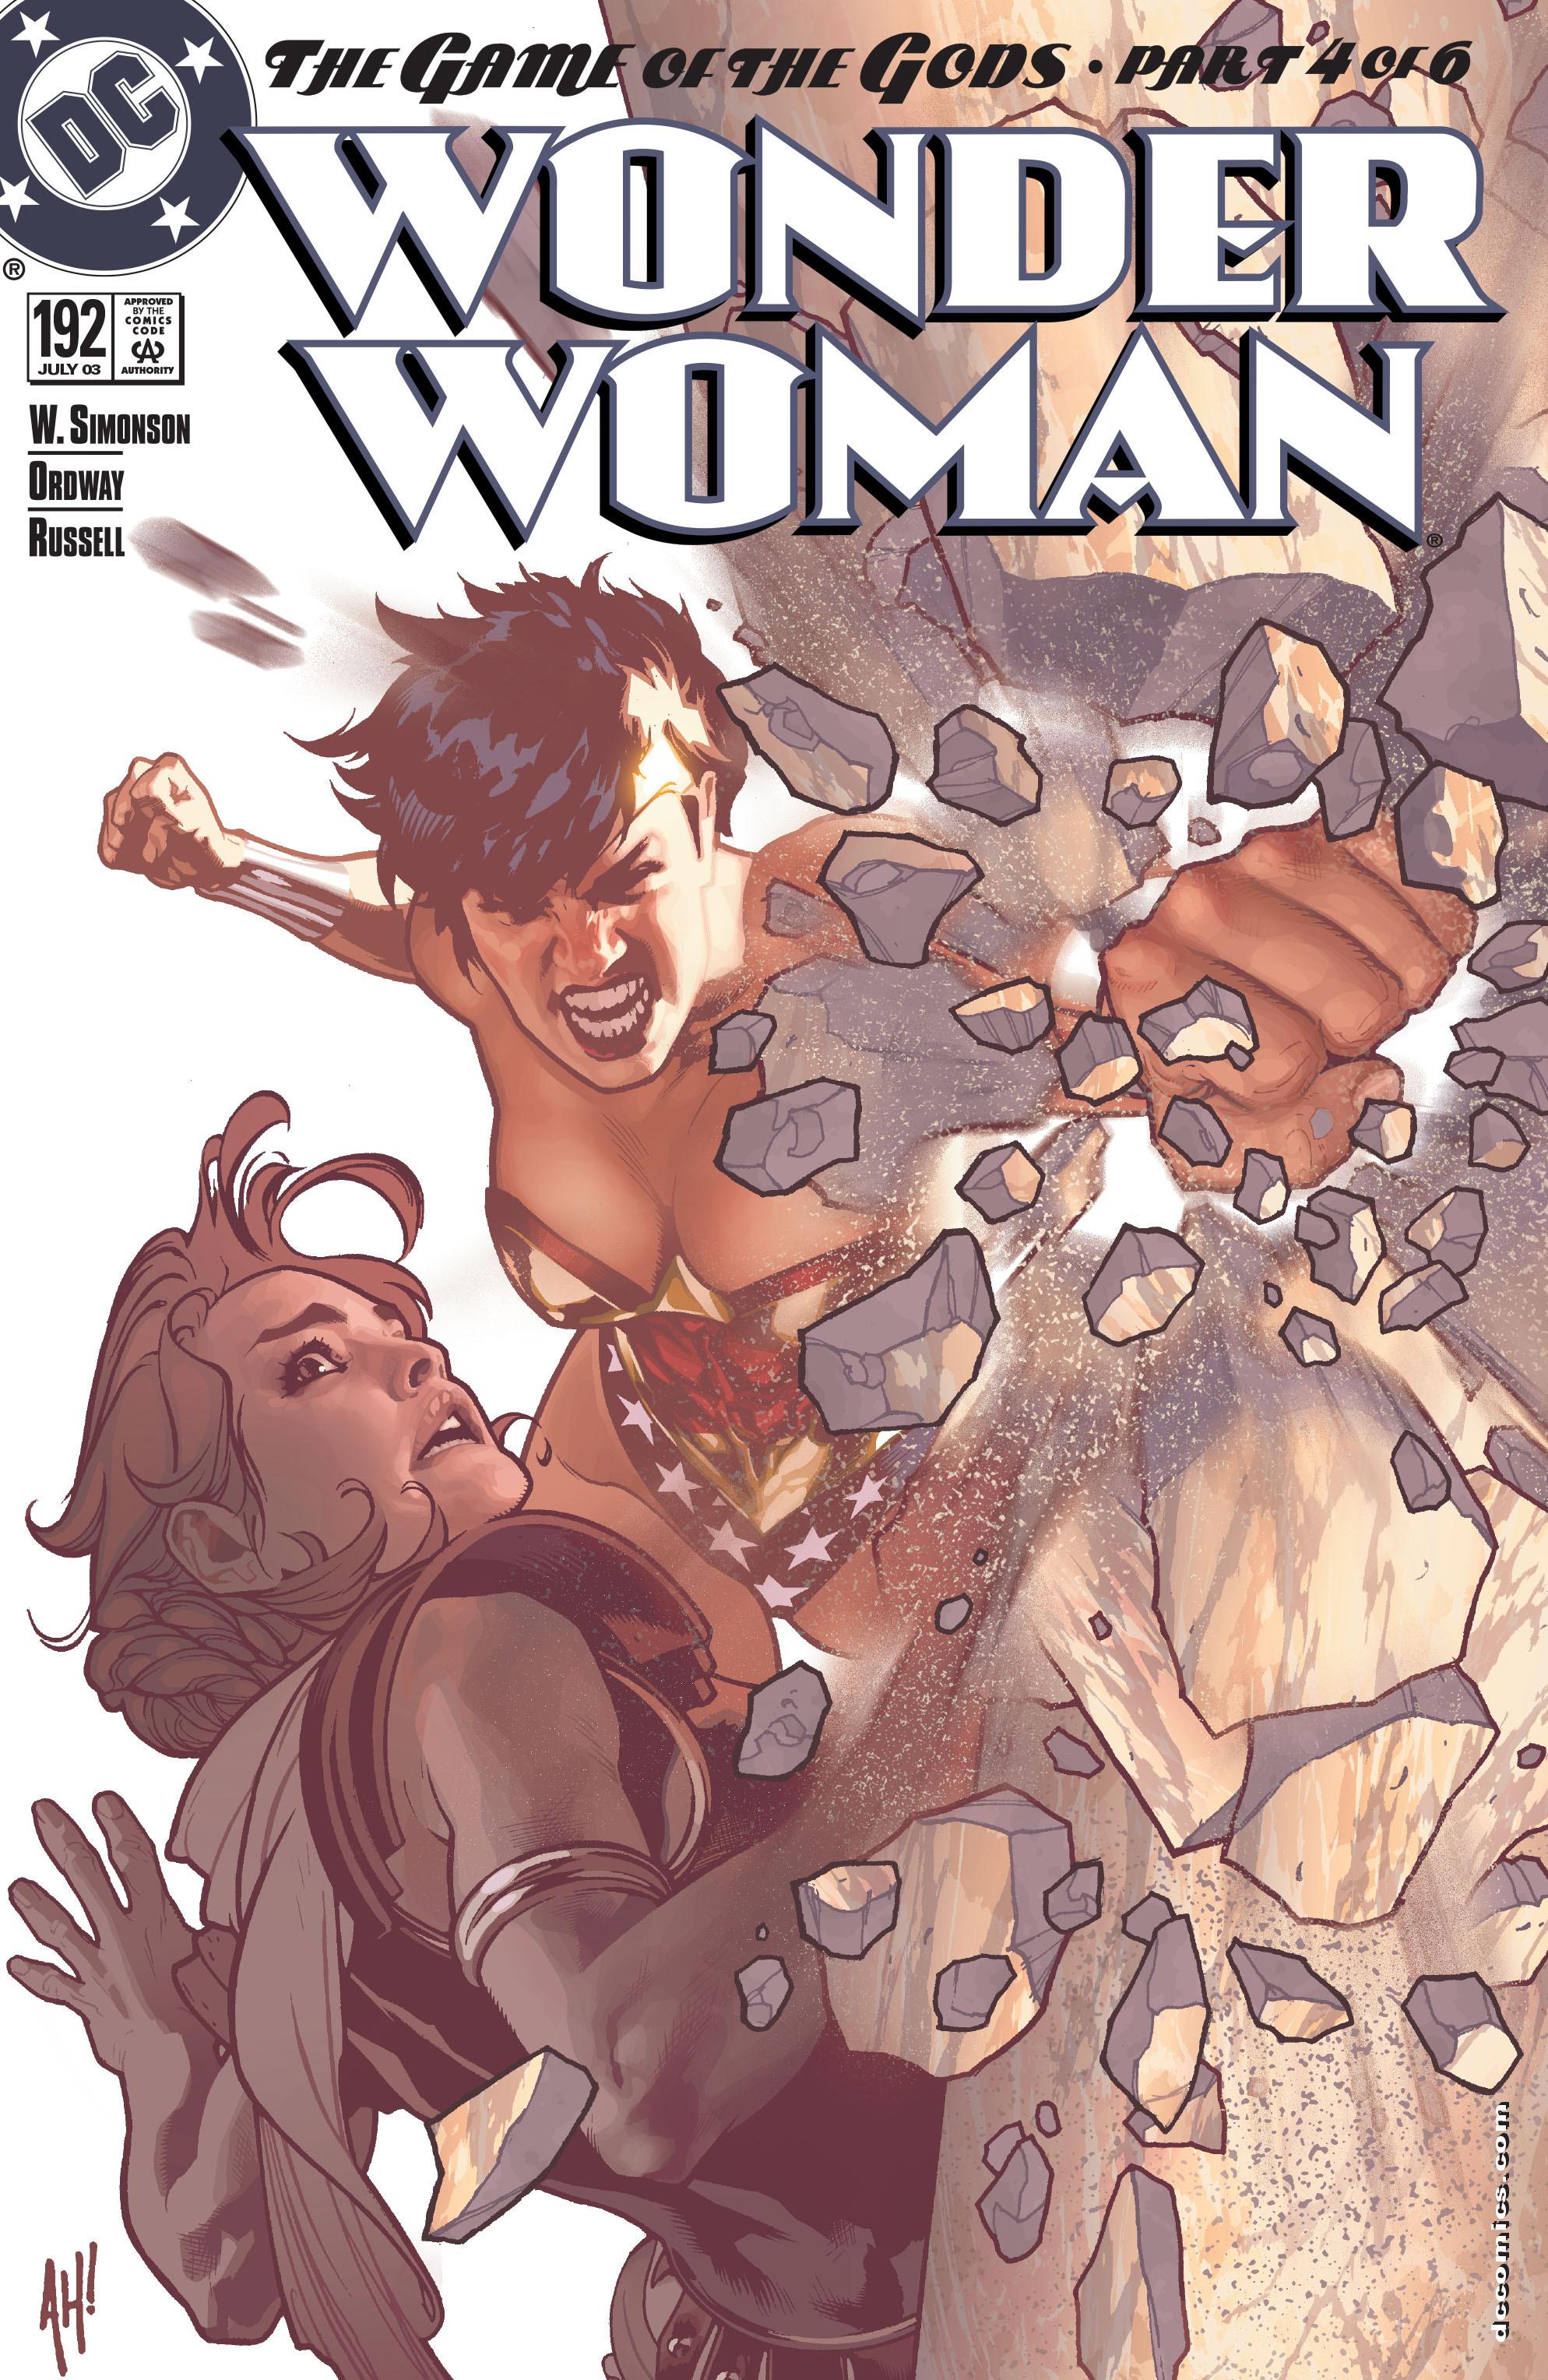 Read online Wonder Woman (1987) comic -  Issue #192 - 1